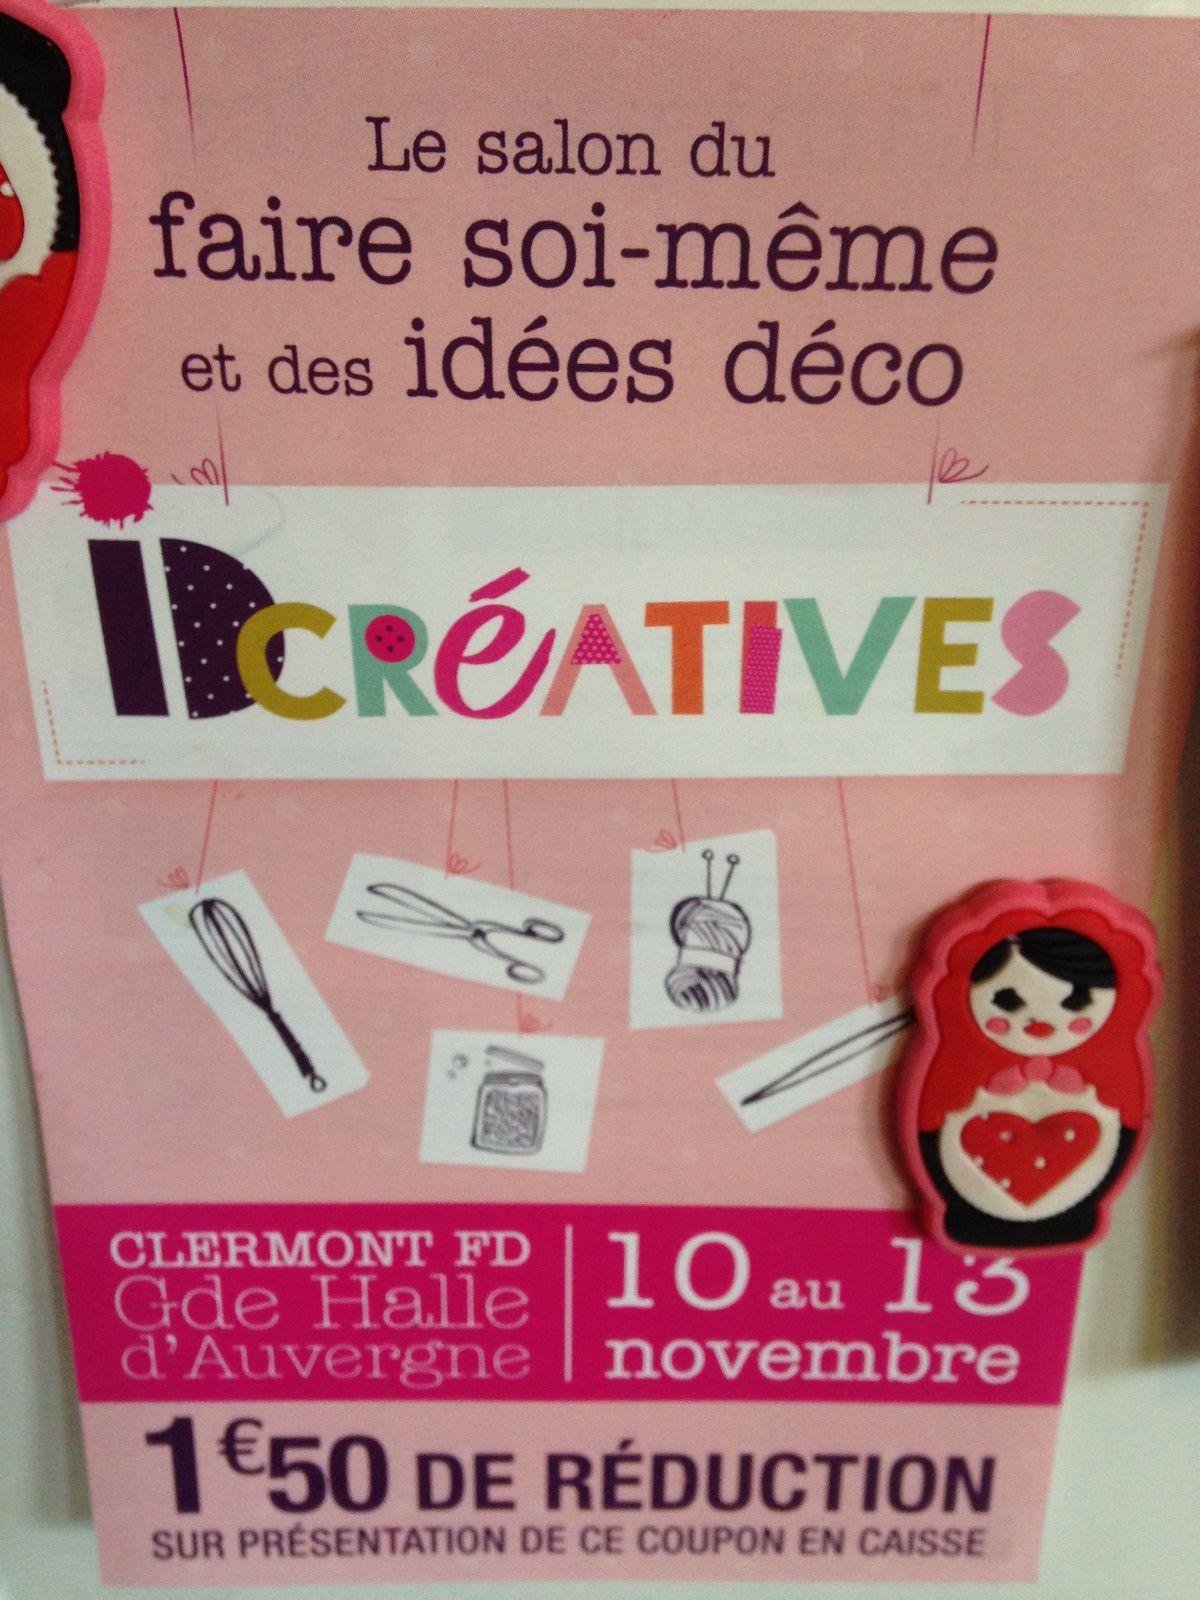 Salon ID creatives à Clermont Ferrand - CharlotteBlaBla: